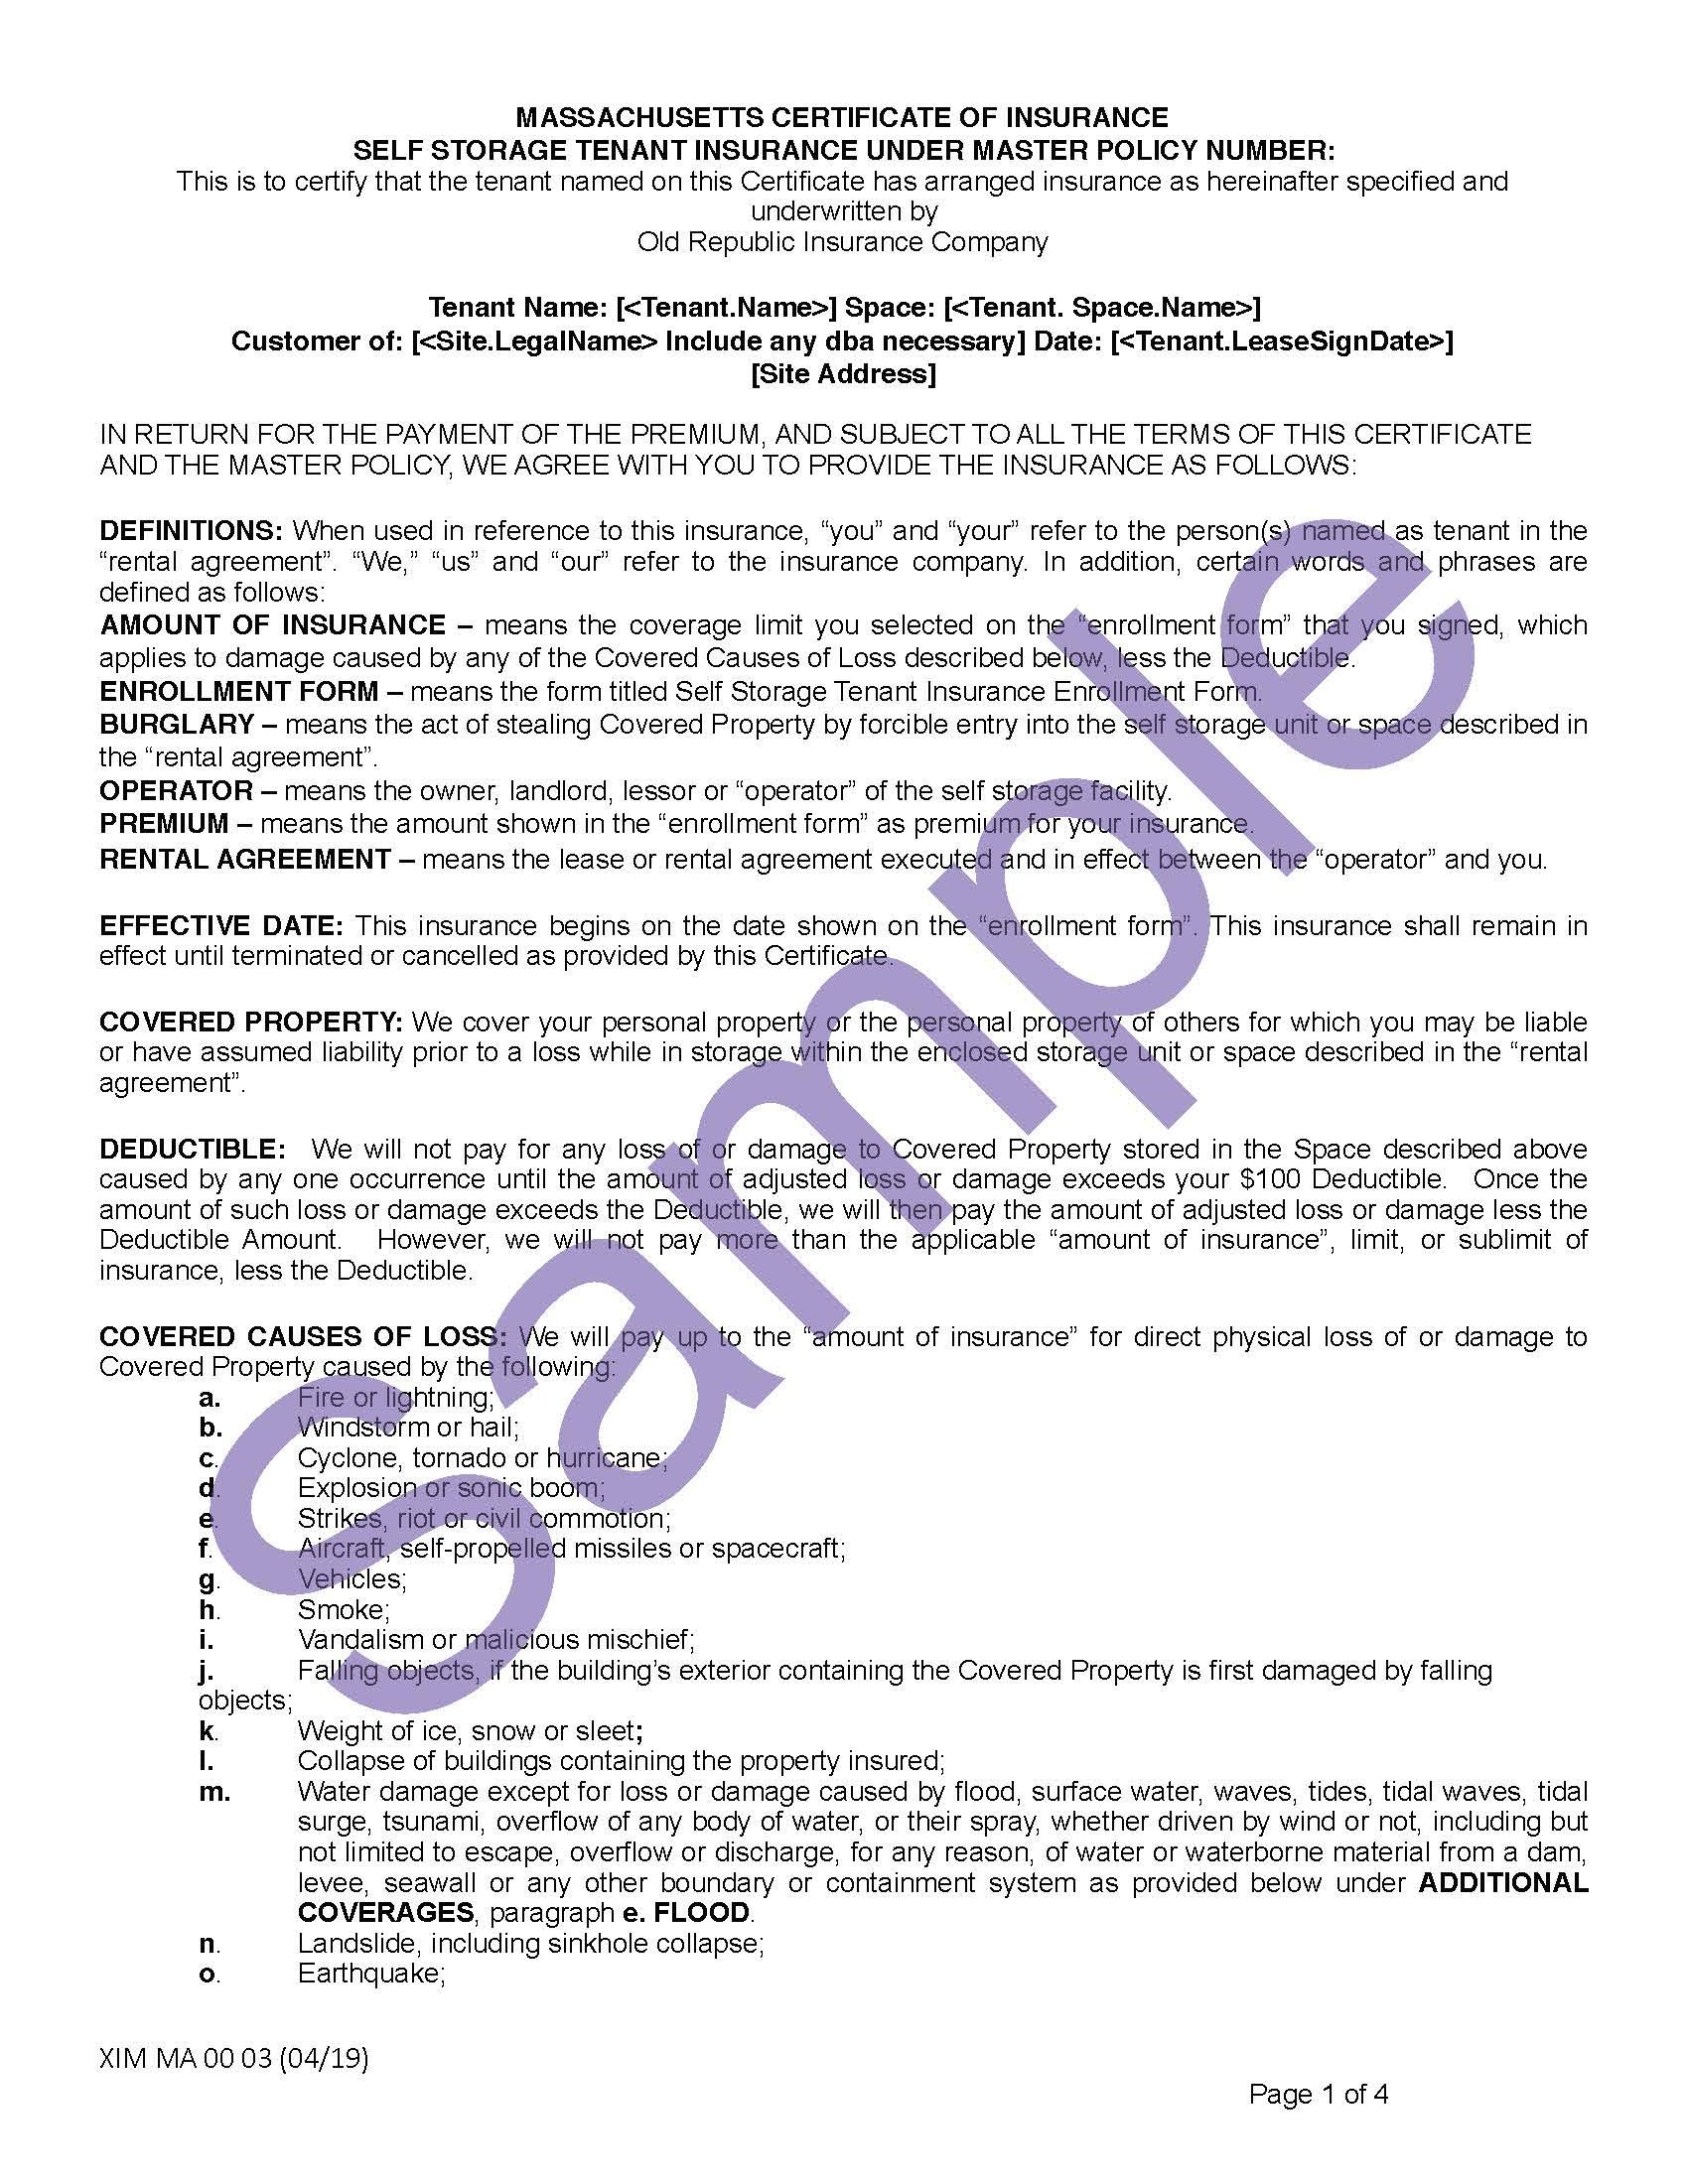 XIM MA 00 03 04 19 Massachusetts Certificate of Storage InsuranceSample_Page_1.jpg